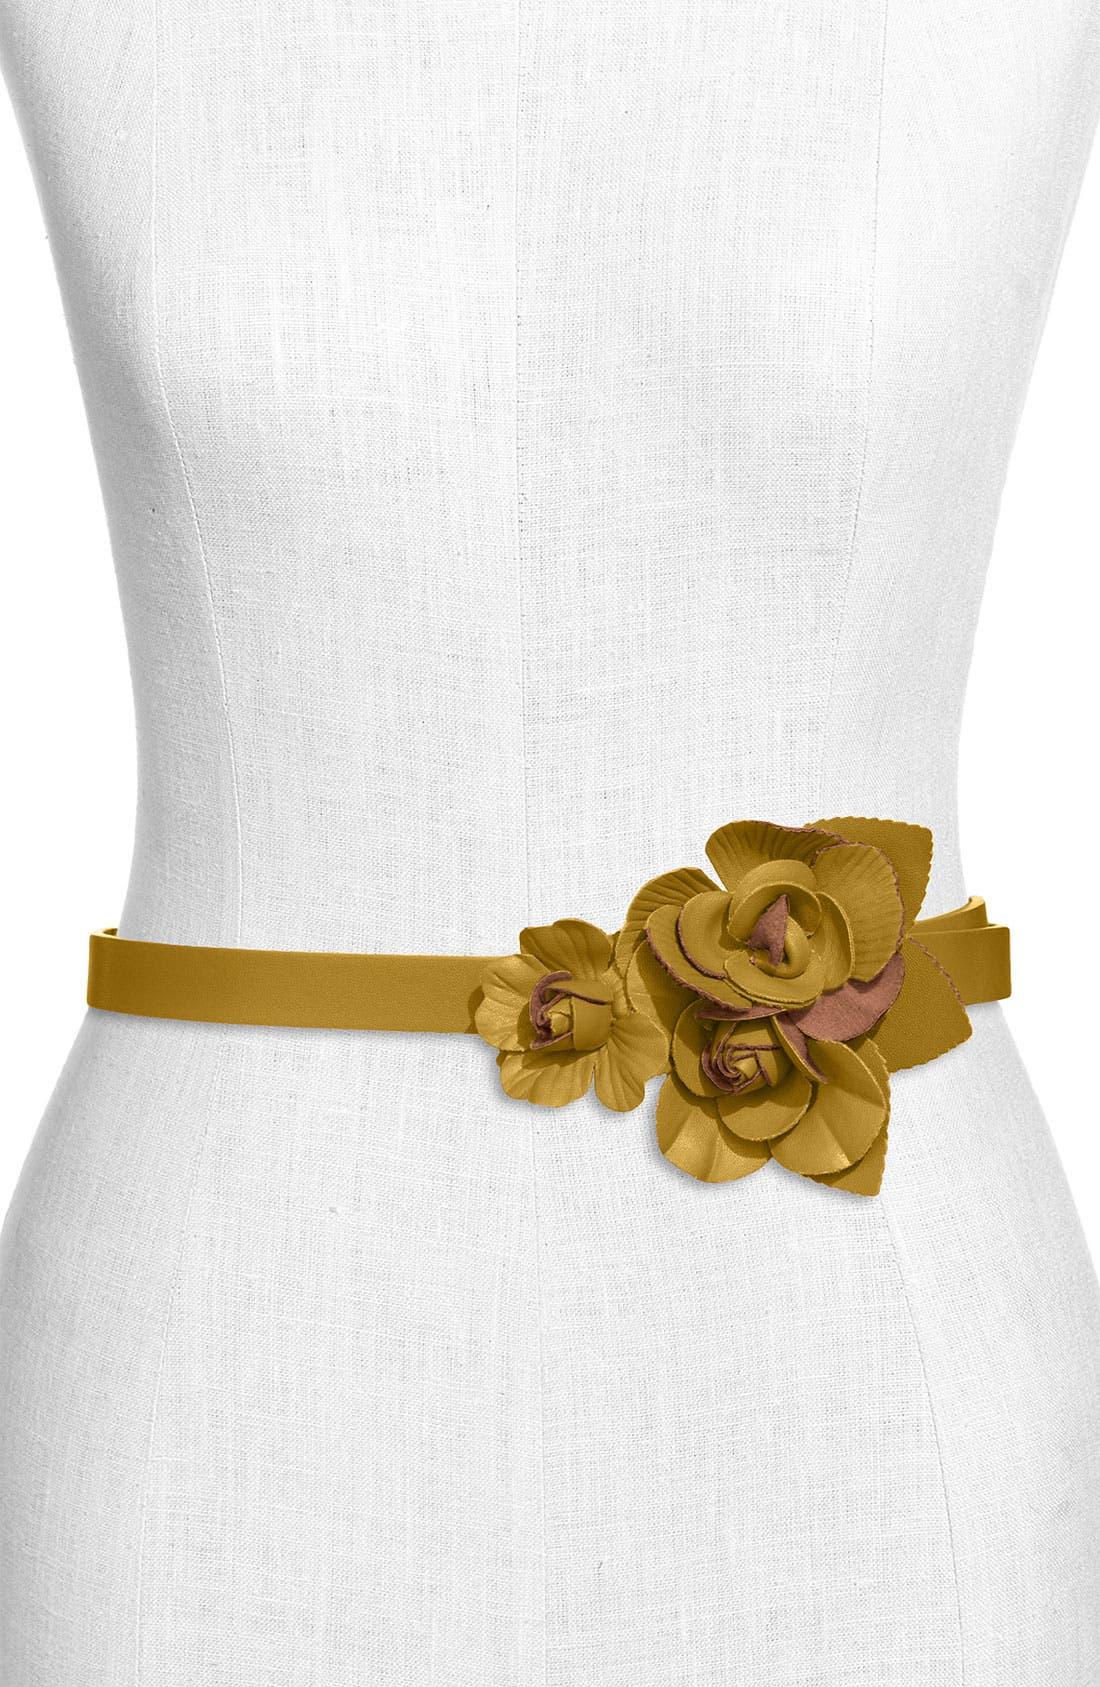 Alternate Image 1 Selected - Tarnish 'Flower' Faux Leather Belt